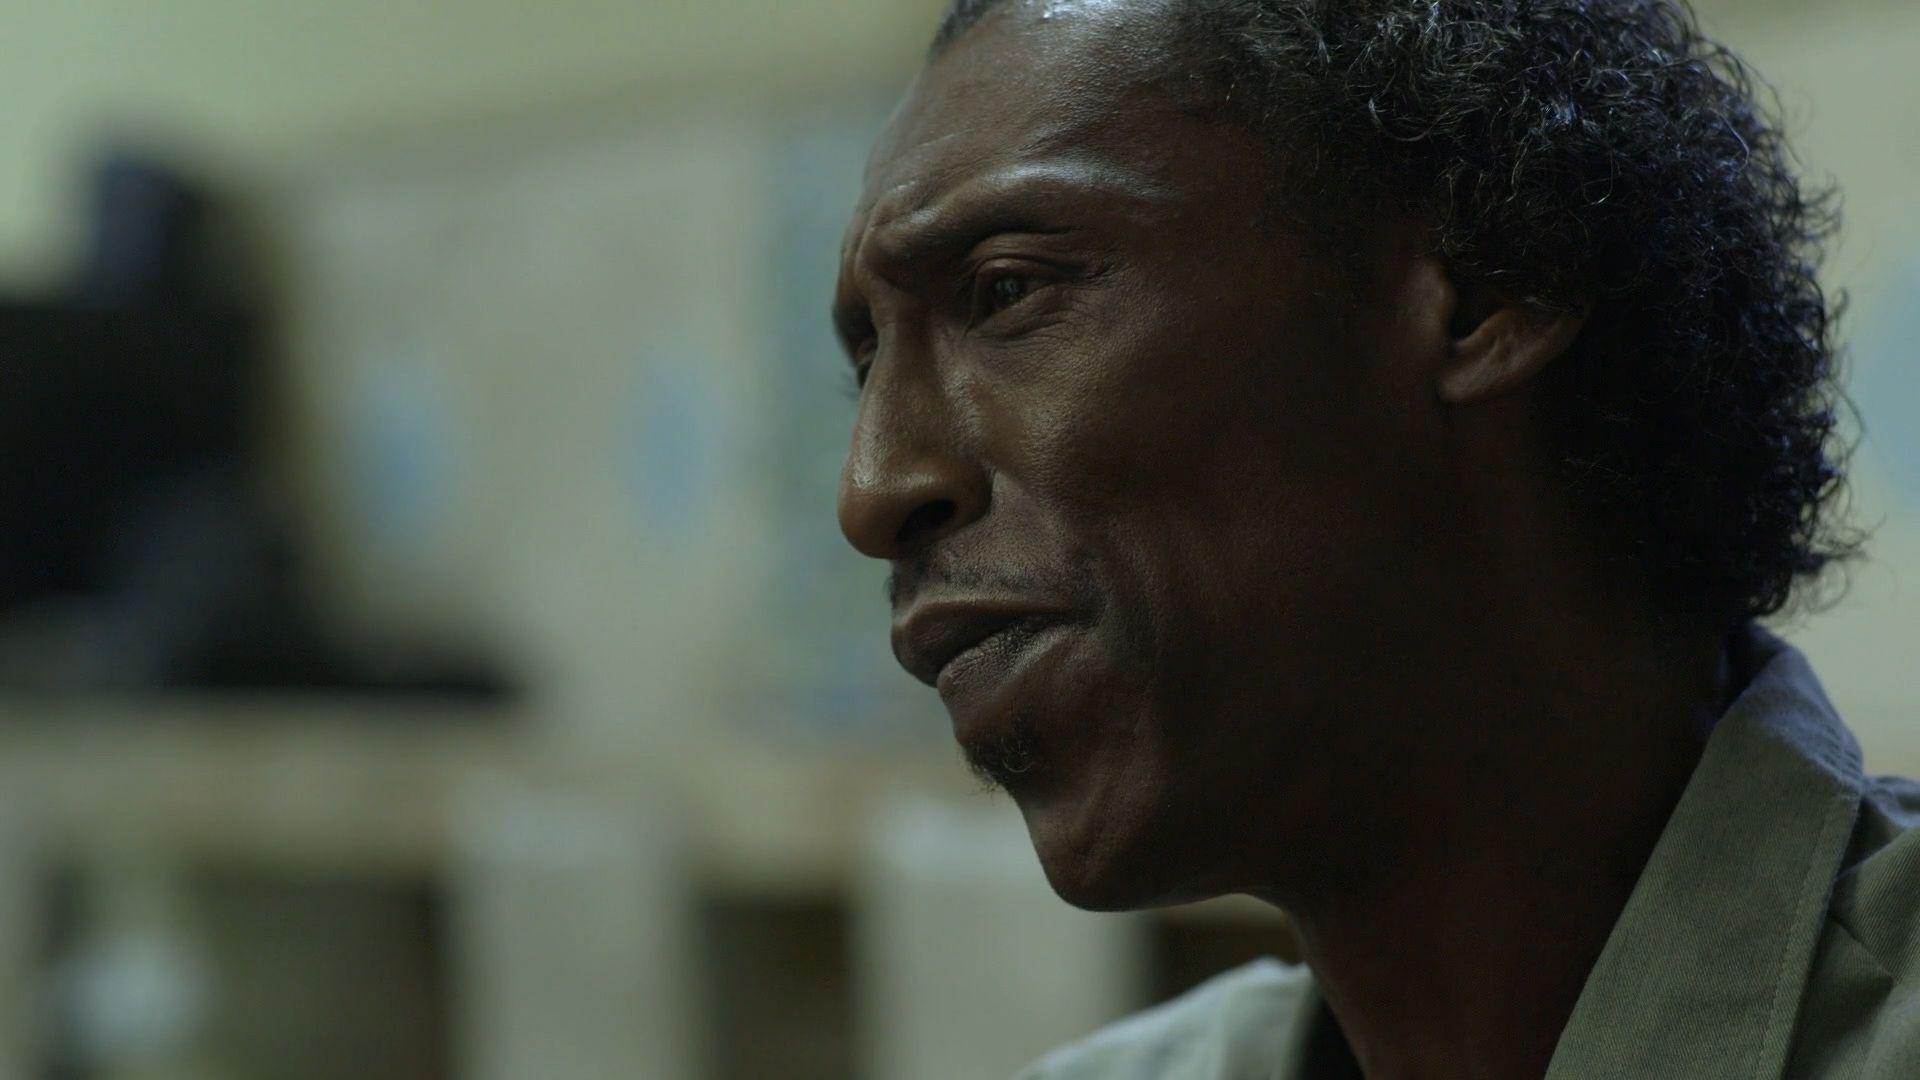 Memphis great films cinematography film